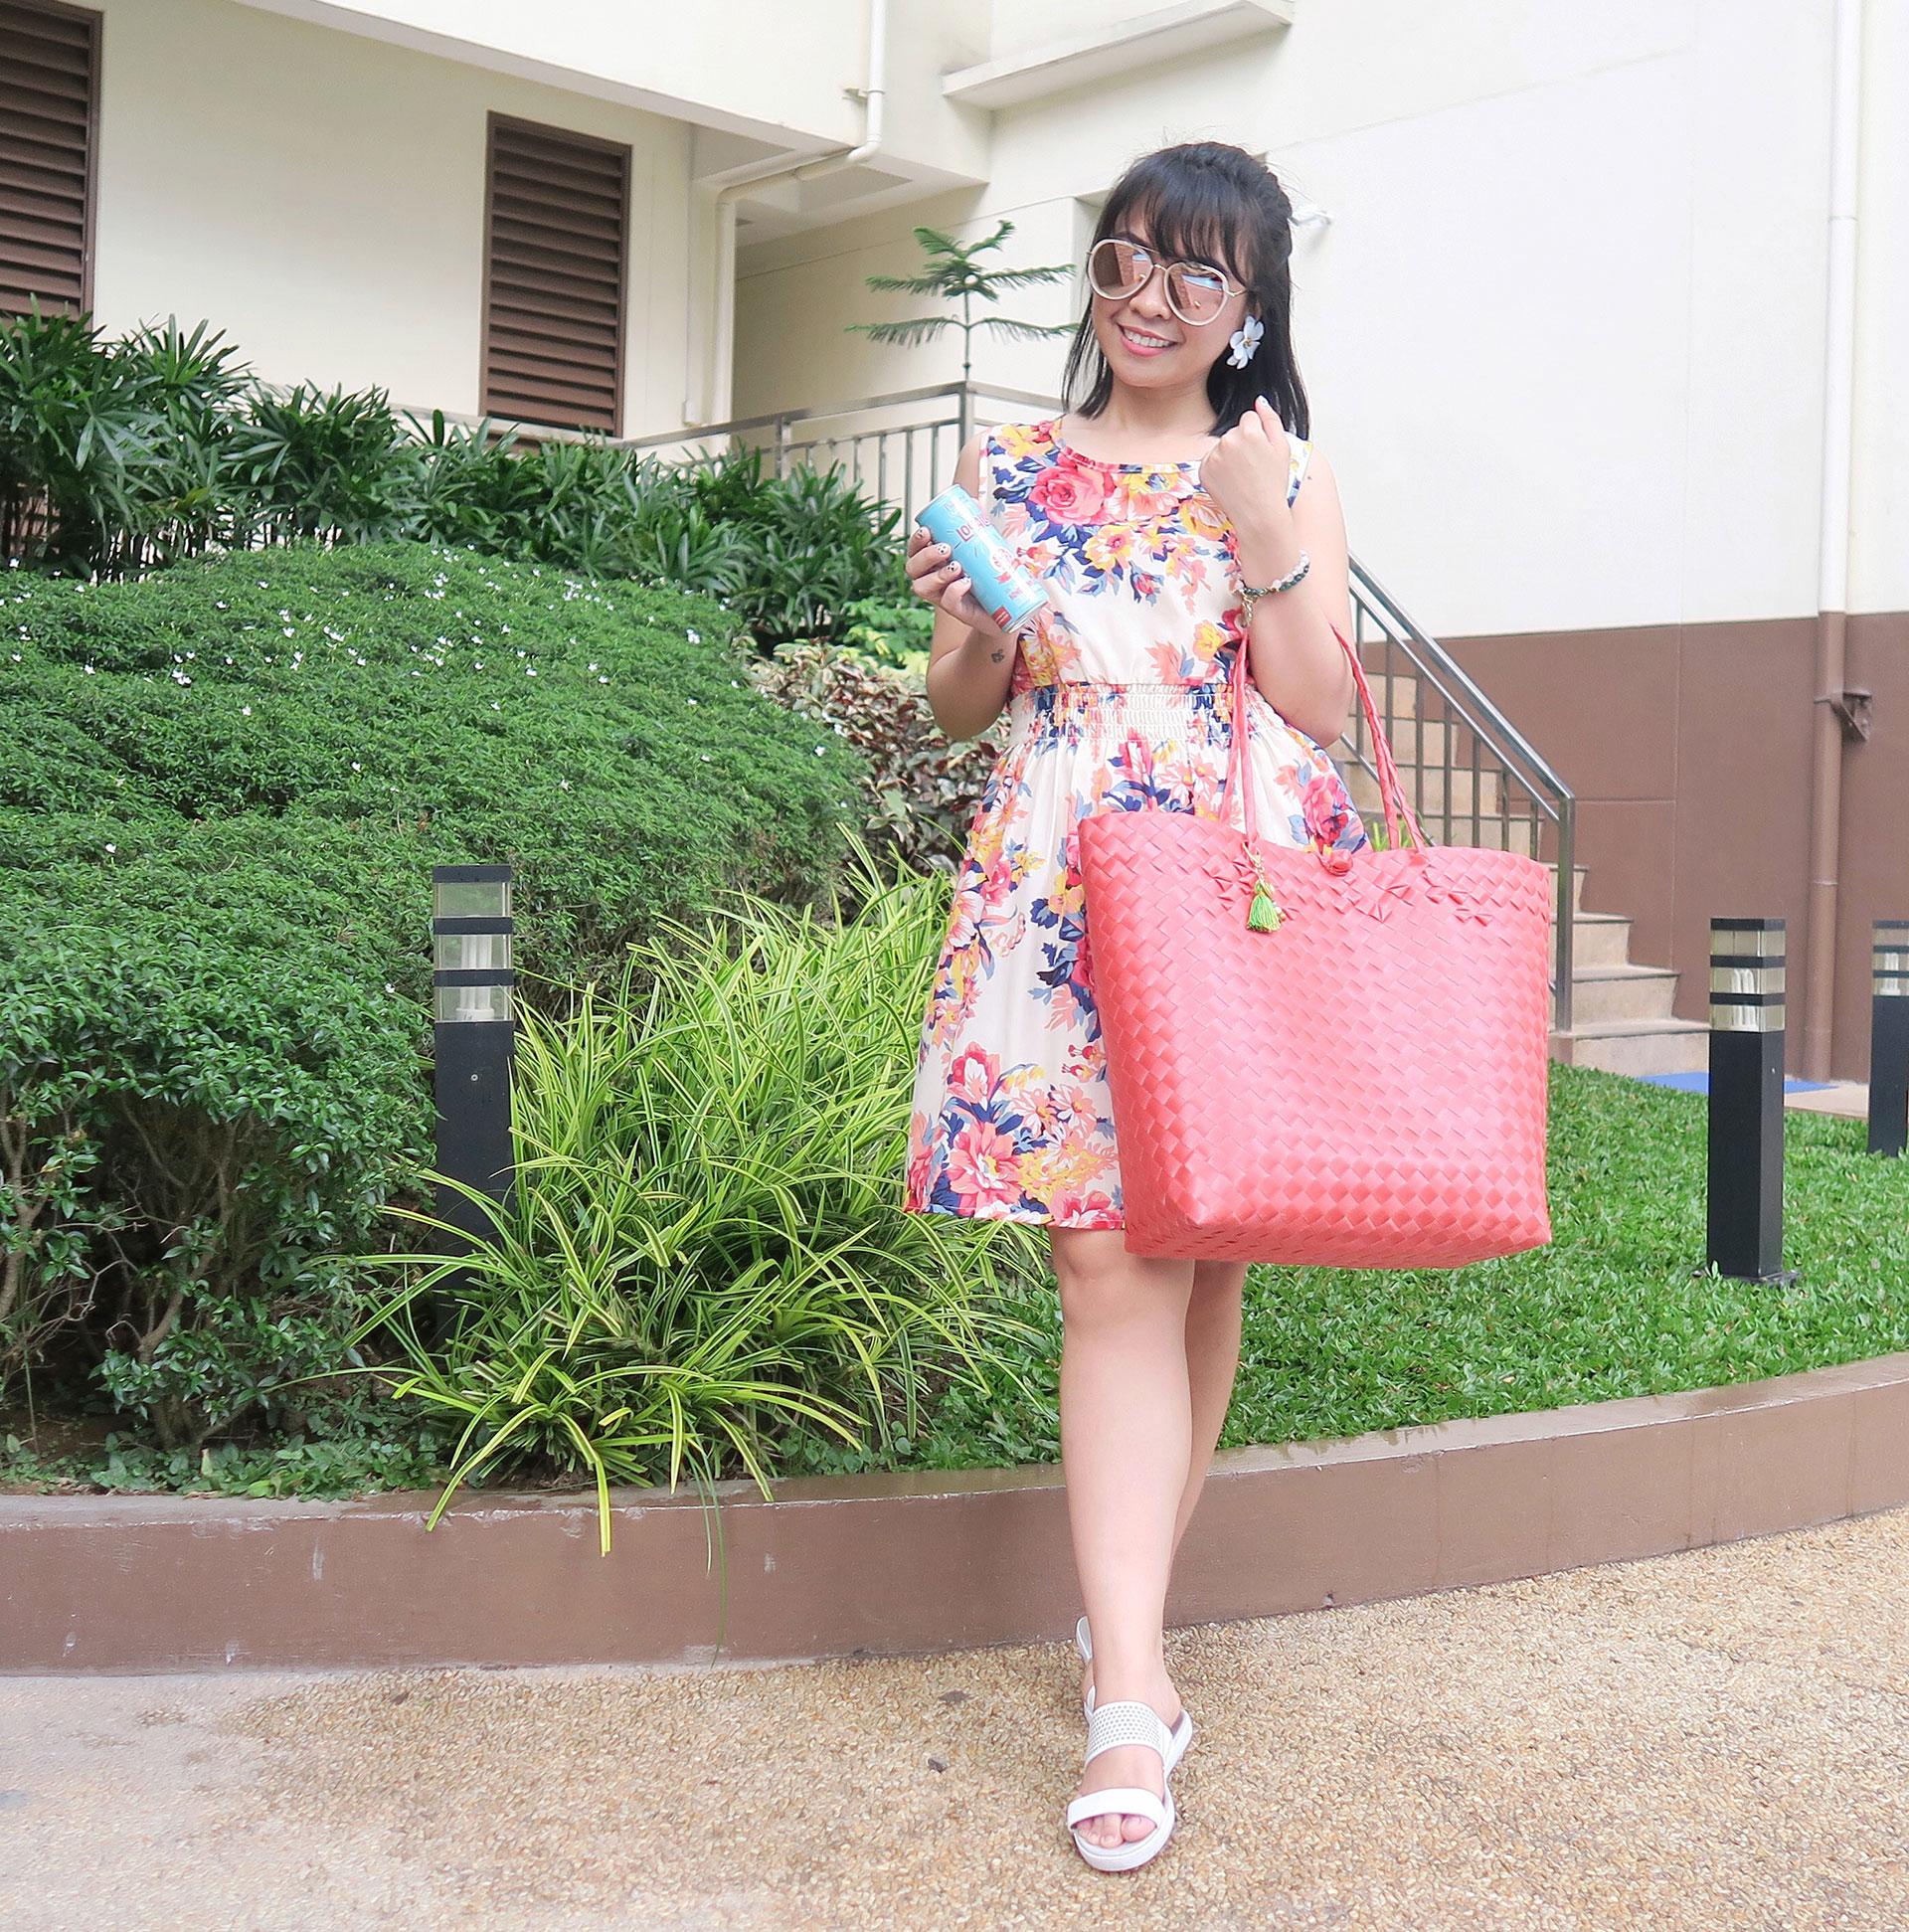 17 Locally Blended Juice Drink Review Photos - Gen-zel She Sings Beauty